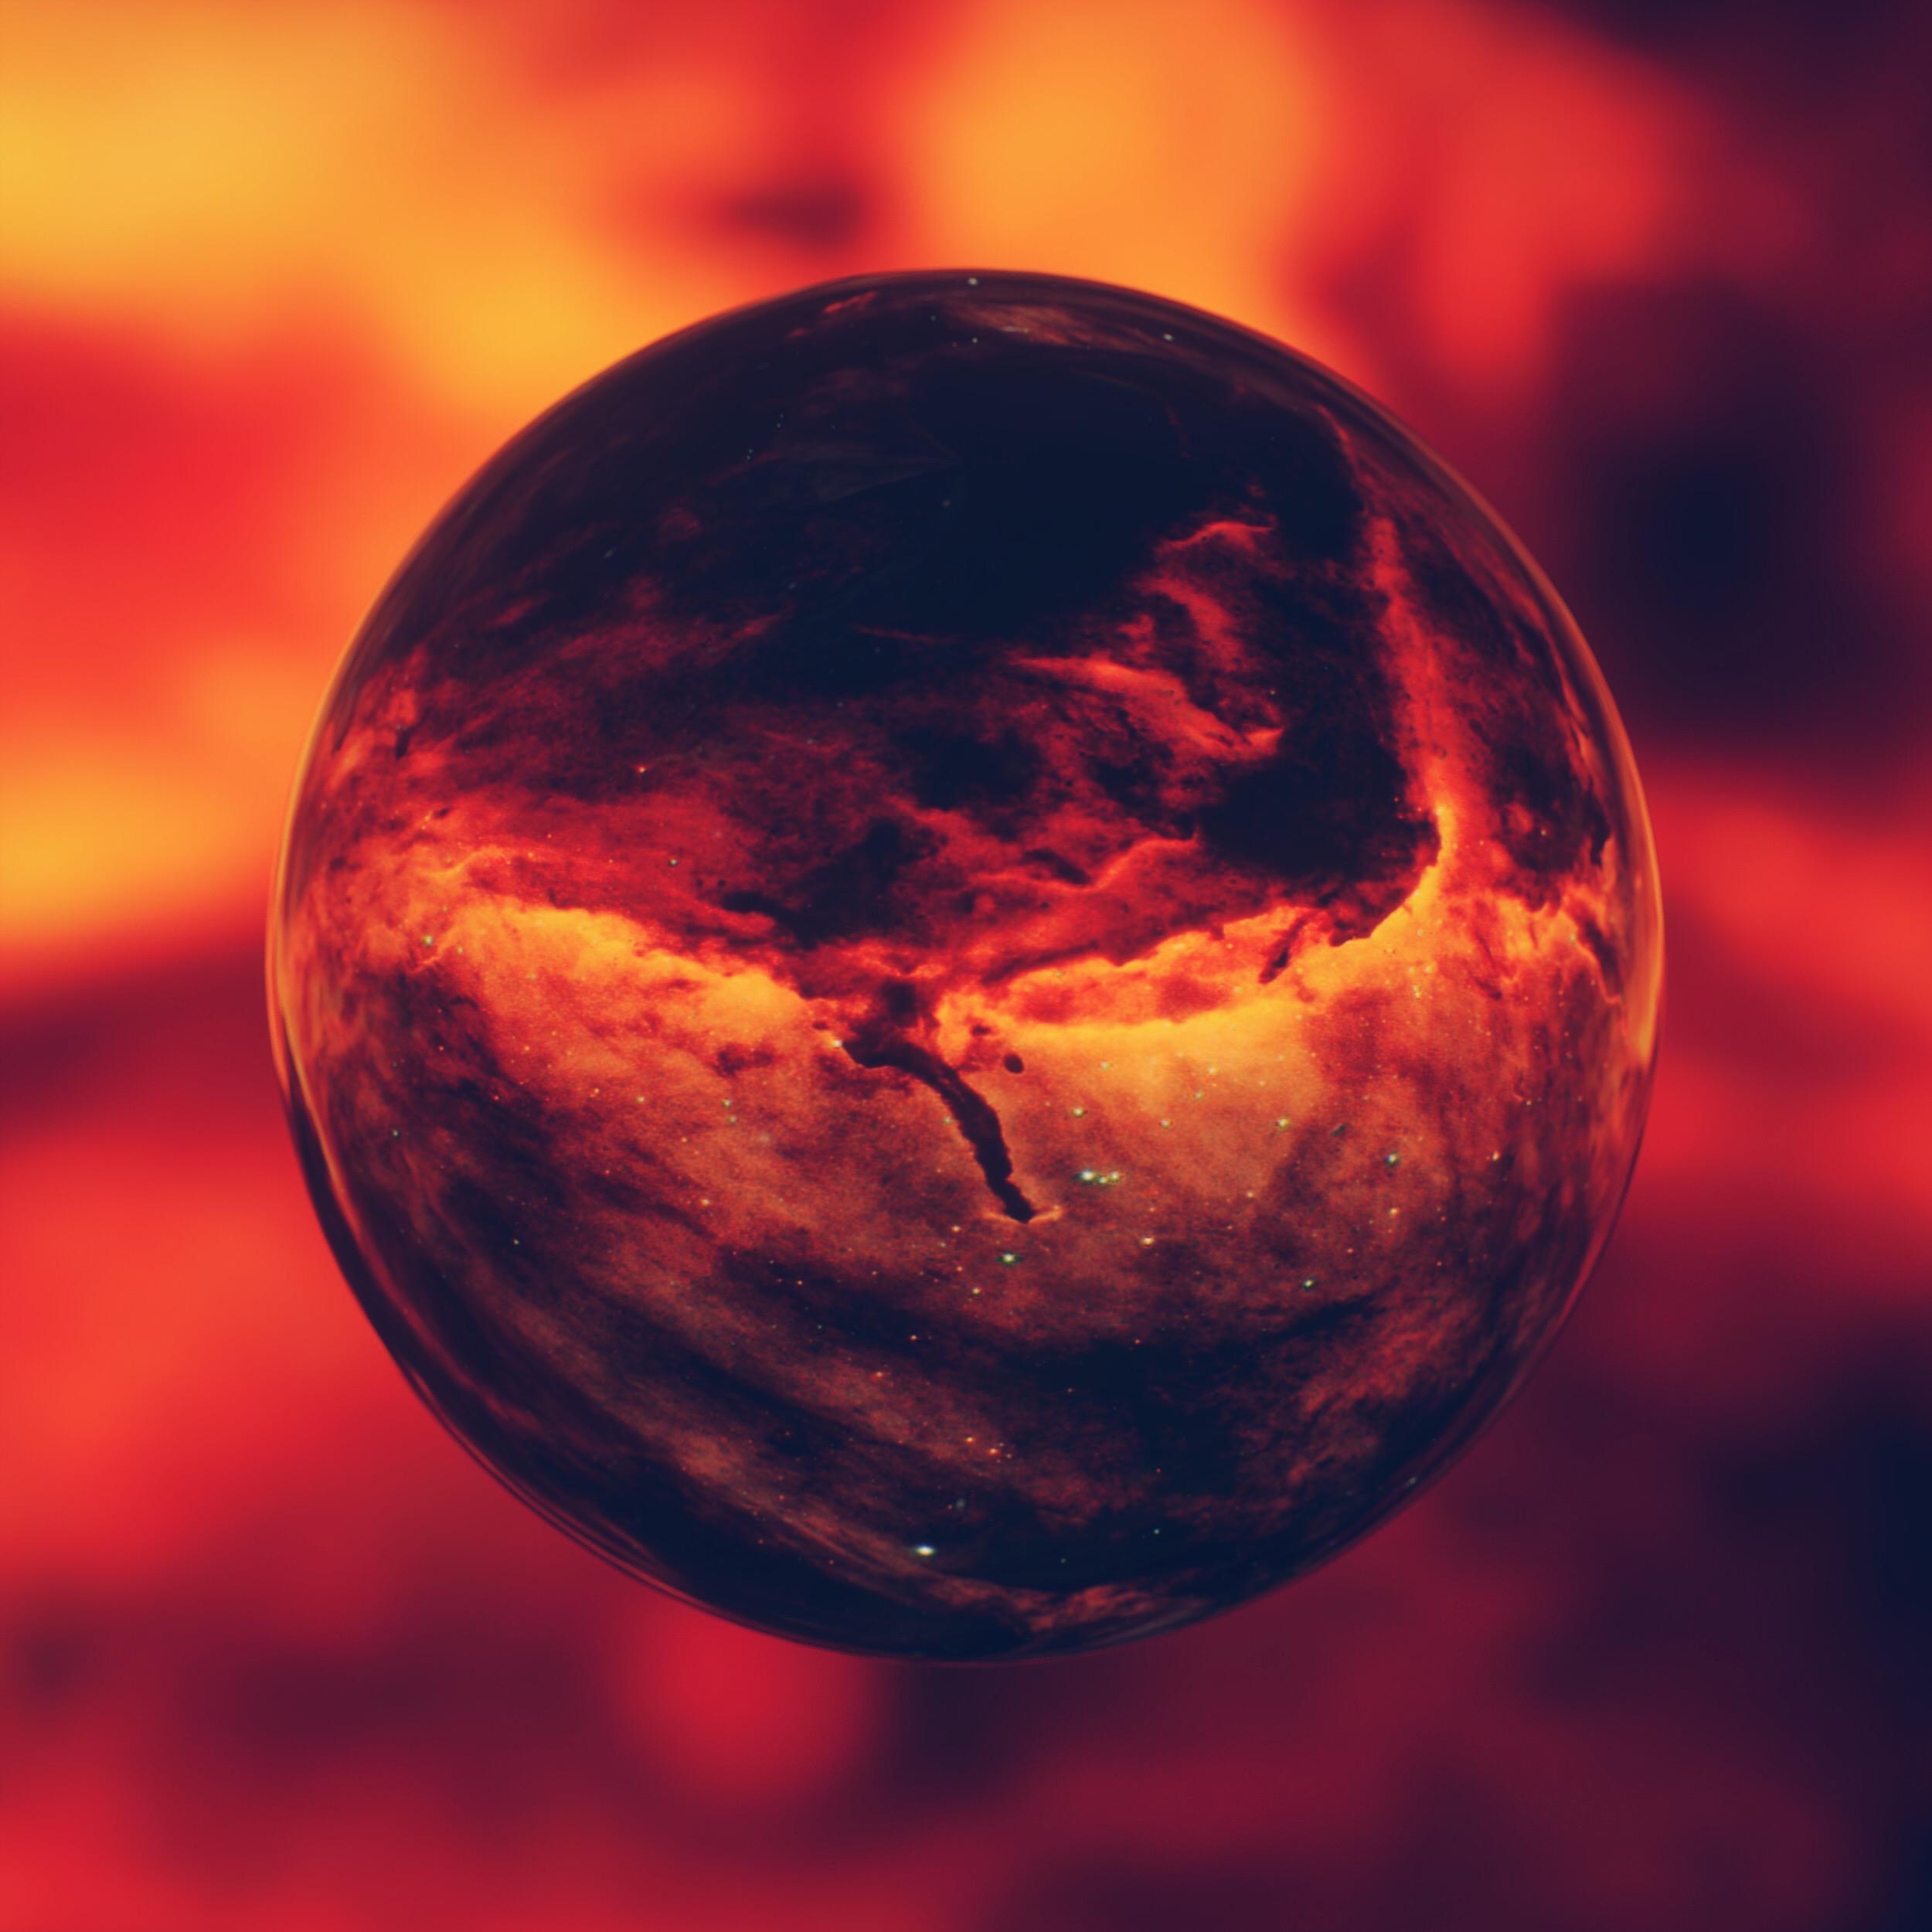 010517_Pelican_Nebula.jpeg